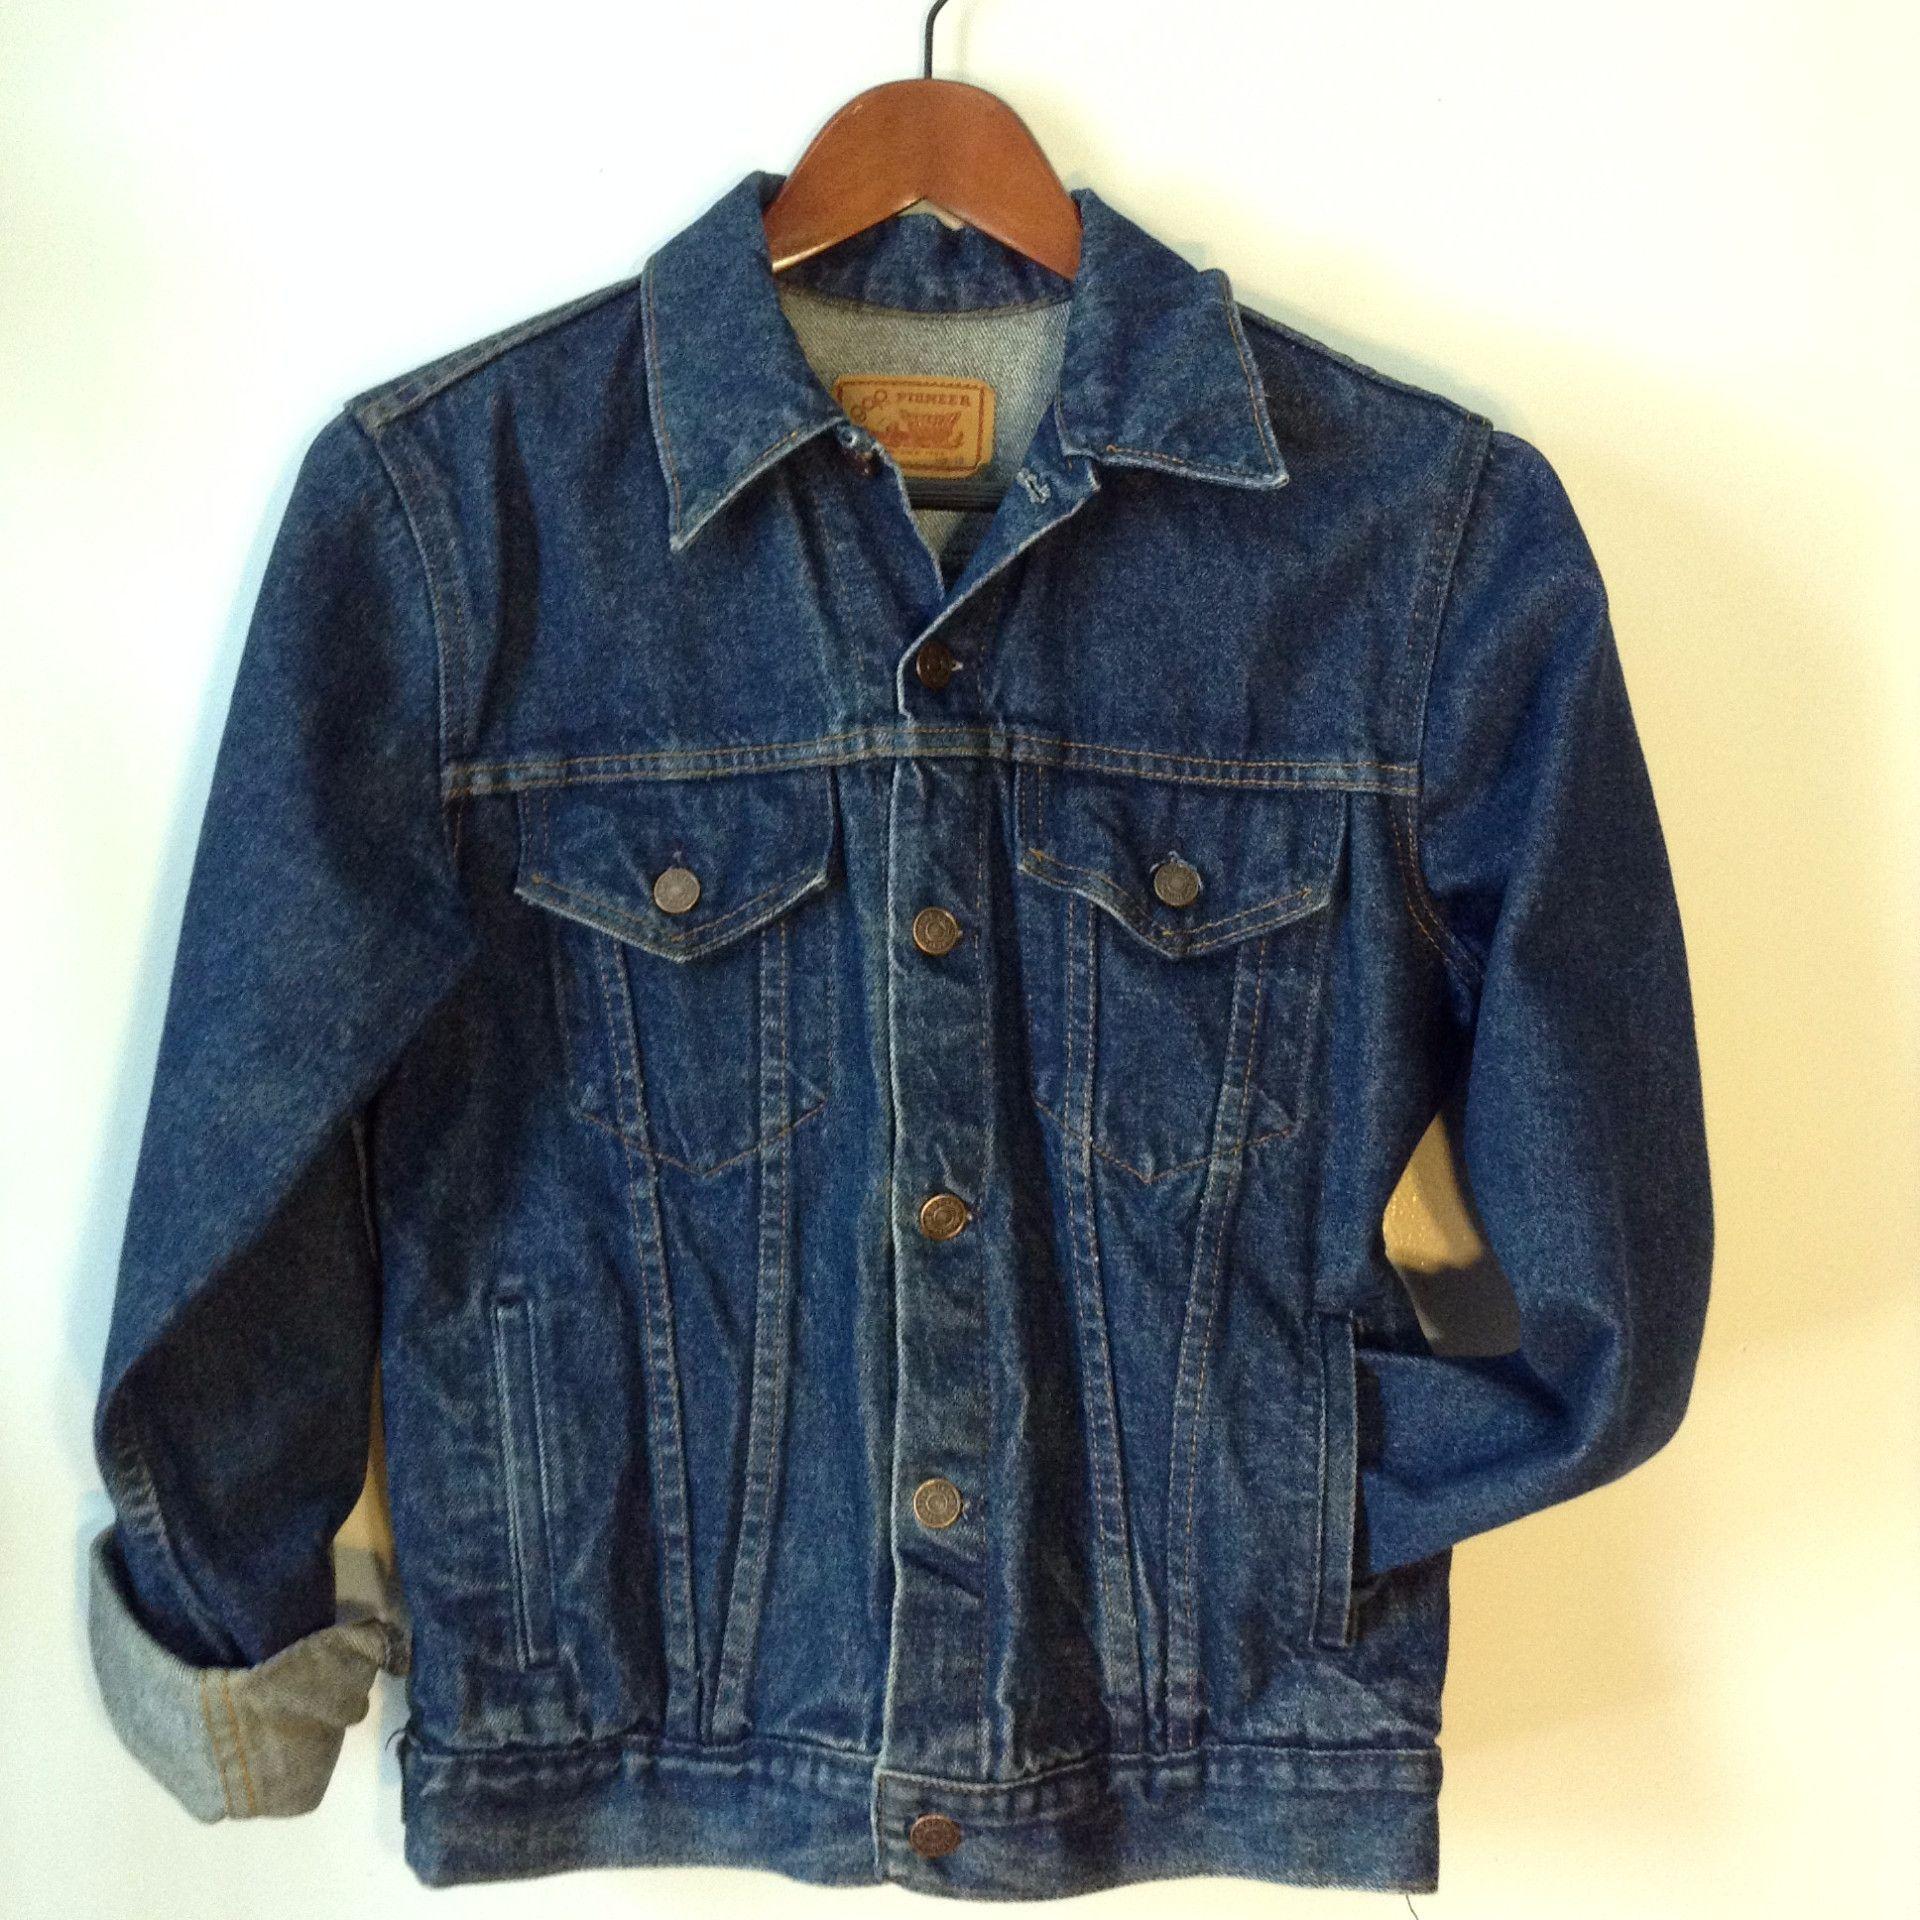 Vintage 90's Gap Denim Jacket L WLCzzS22